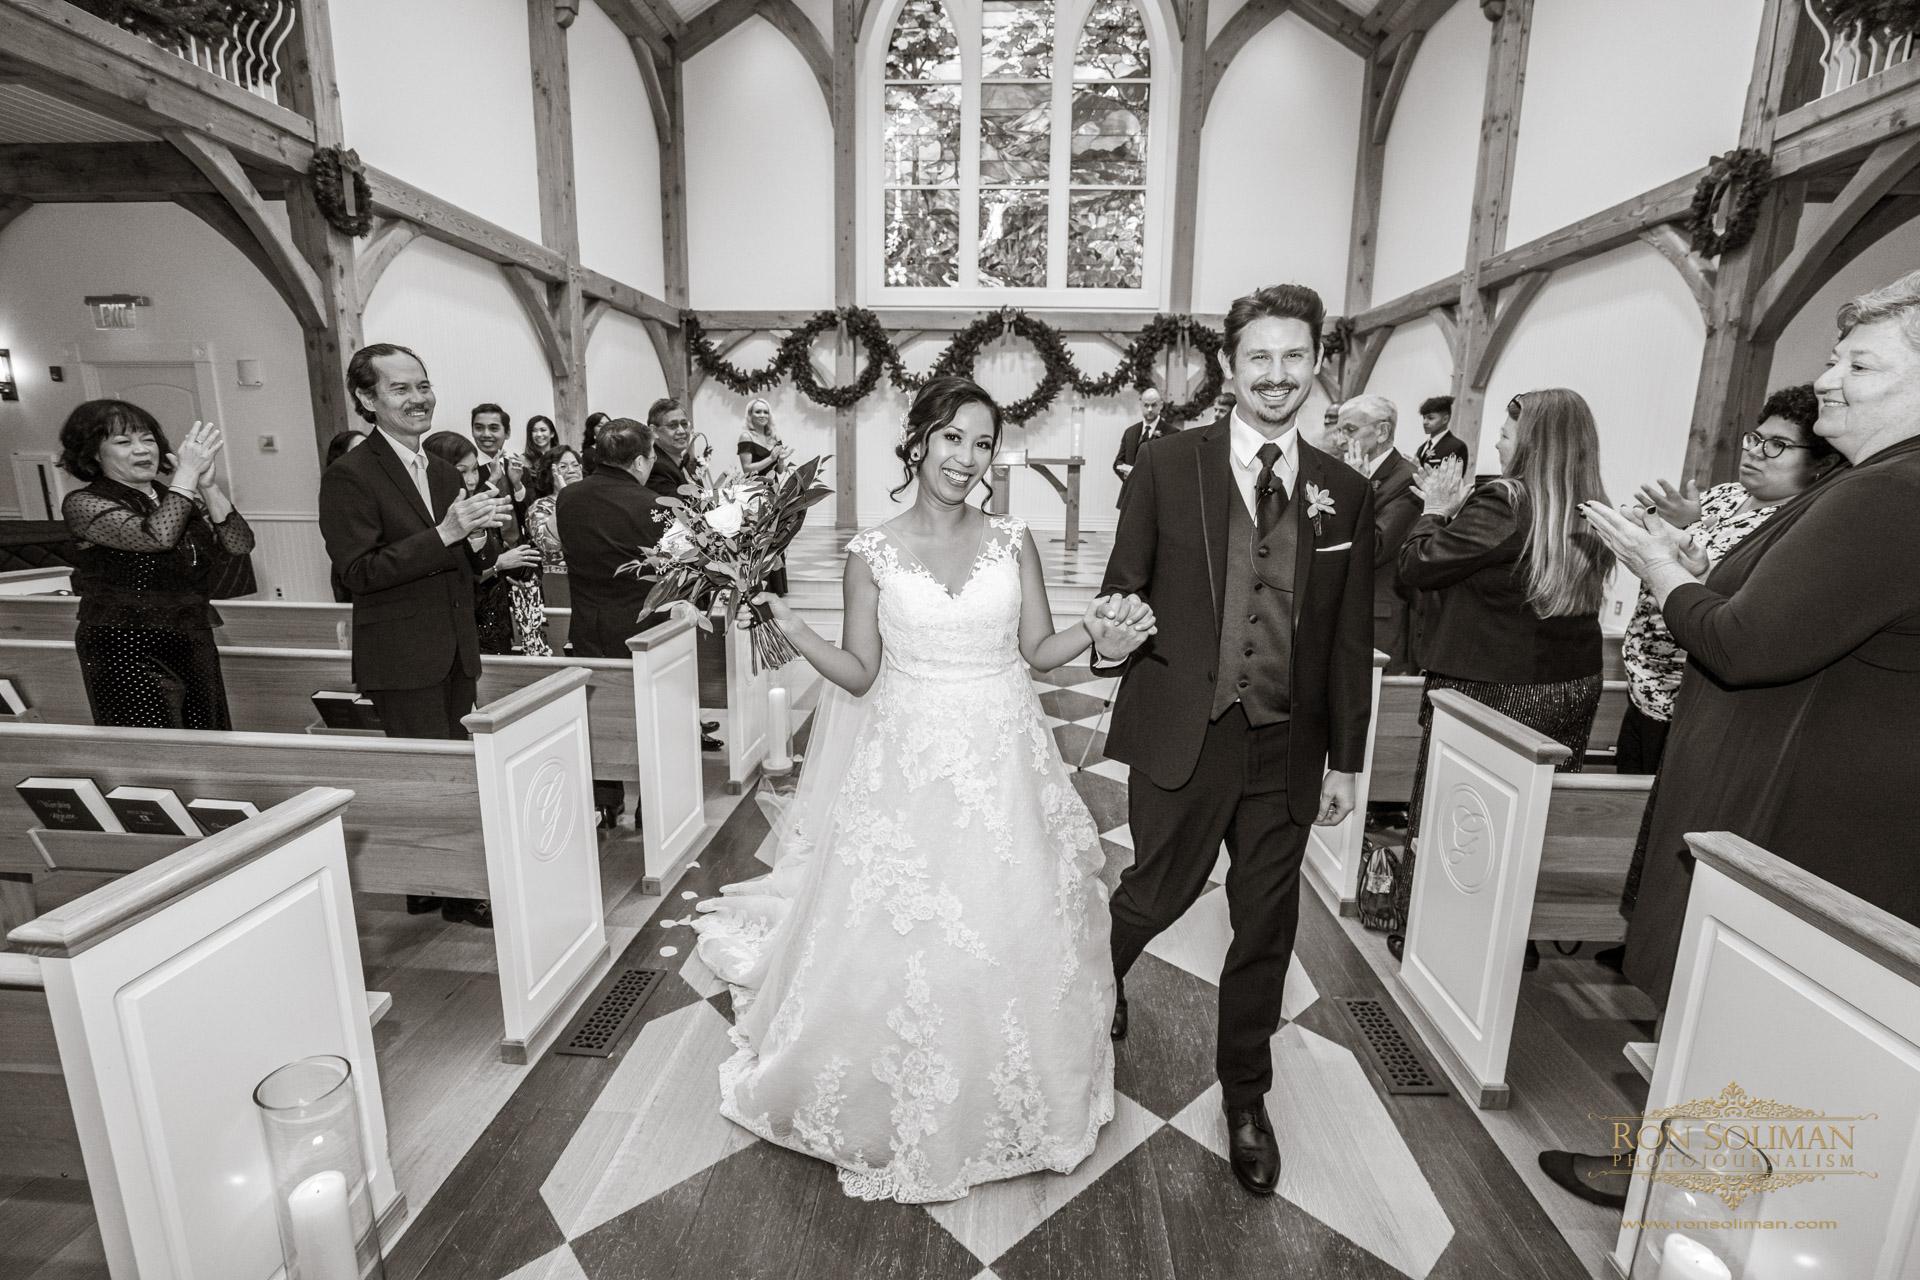 THE GREENBRIER RESORT WEDDING 35